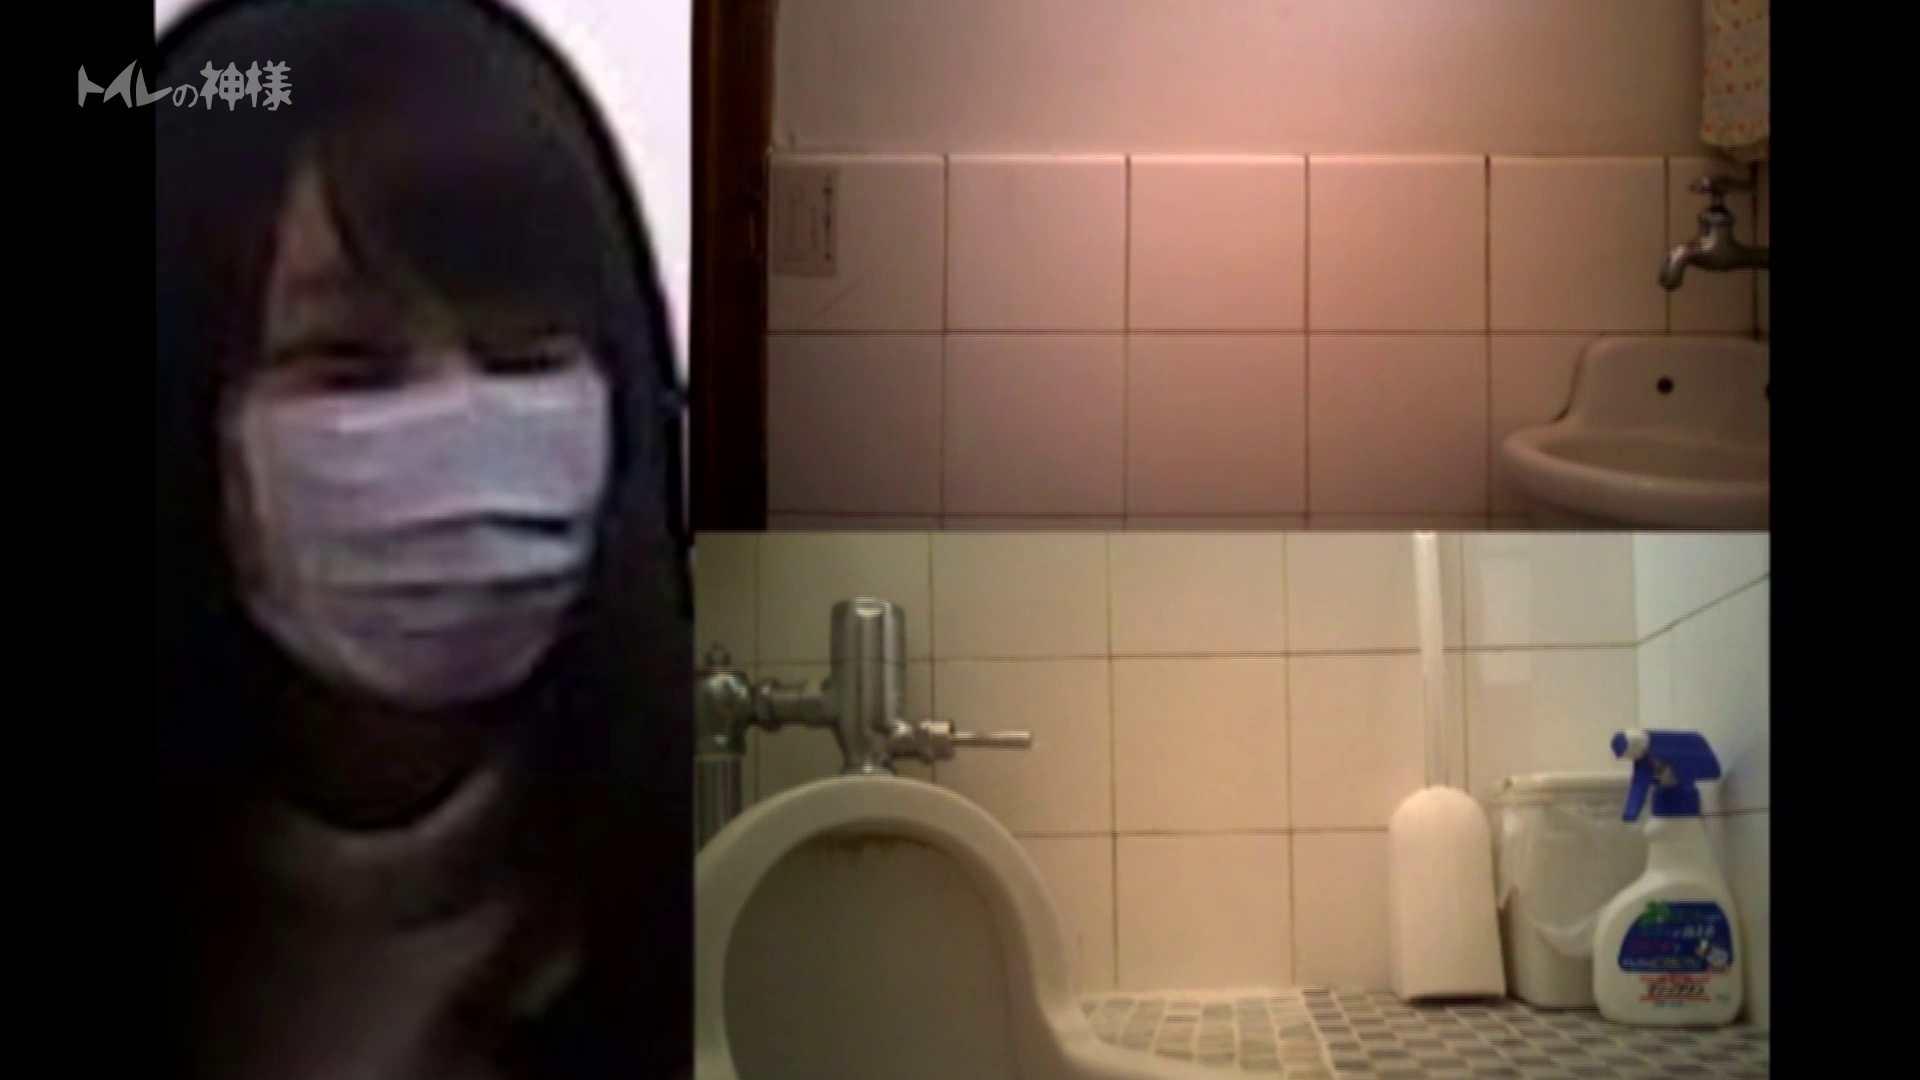 Vol.02 花の女子大生うんこ盗撮2 萌え女子大生 | 女体盗撮  97連発 26